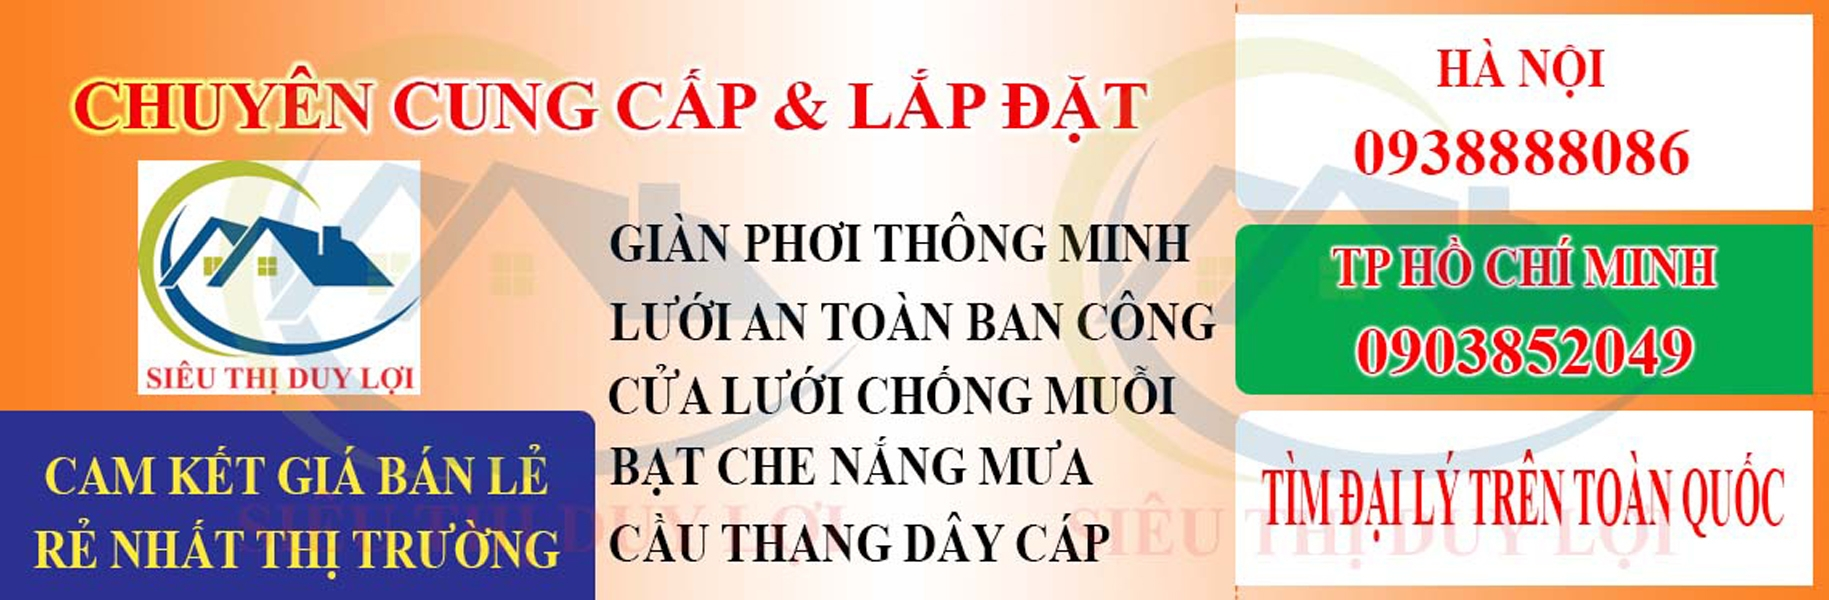 Siêu Thị Duy Lợi (@sieuthidl) Cover Image